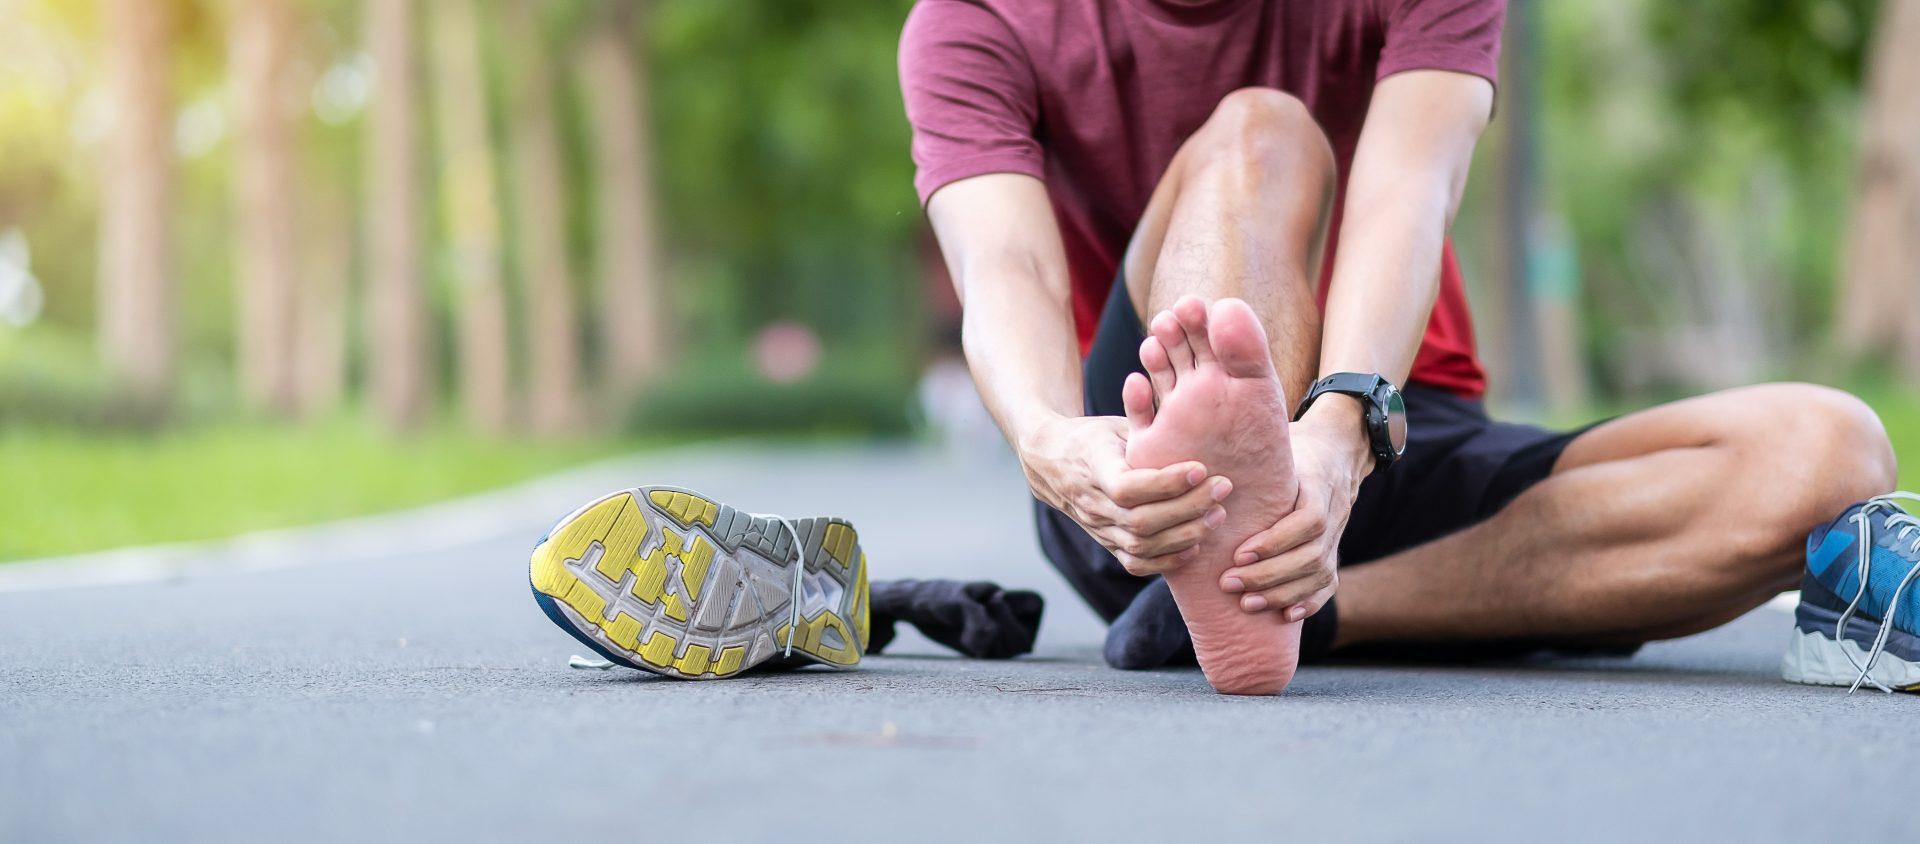 Run With Plantar Fasciitis